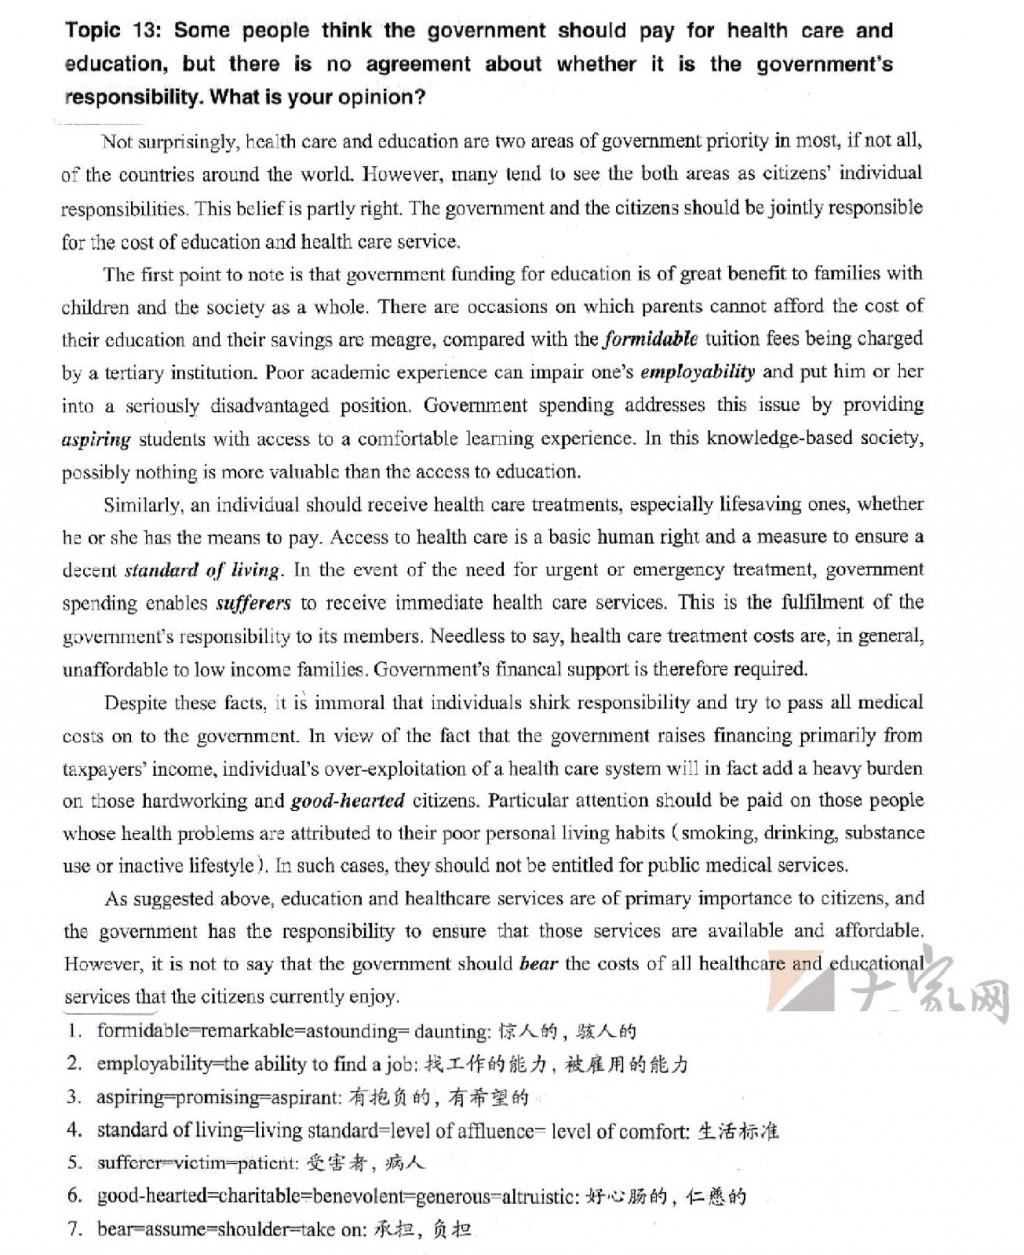 008 Writingtask2rezagholami0013 Ielts Essay Writing General Training Unique Topics For Pdf Samples Large